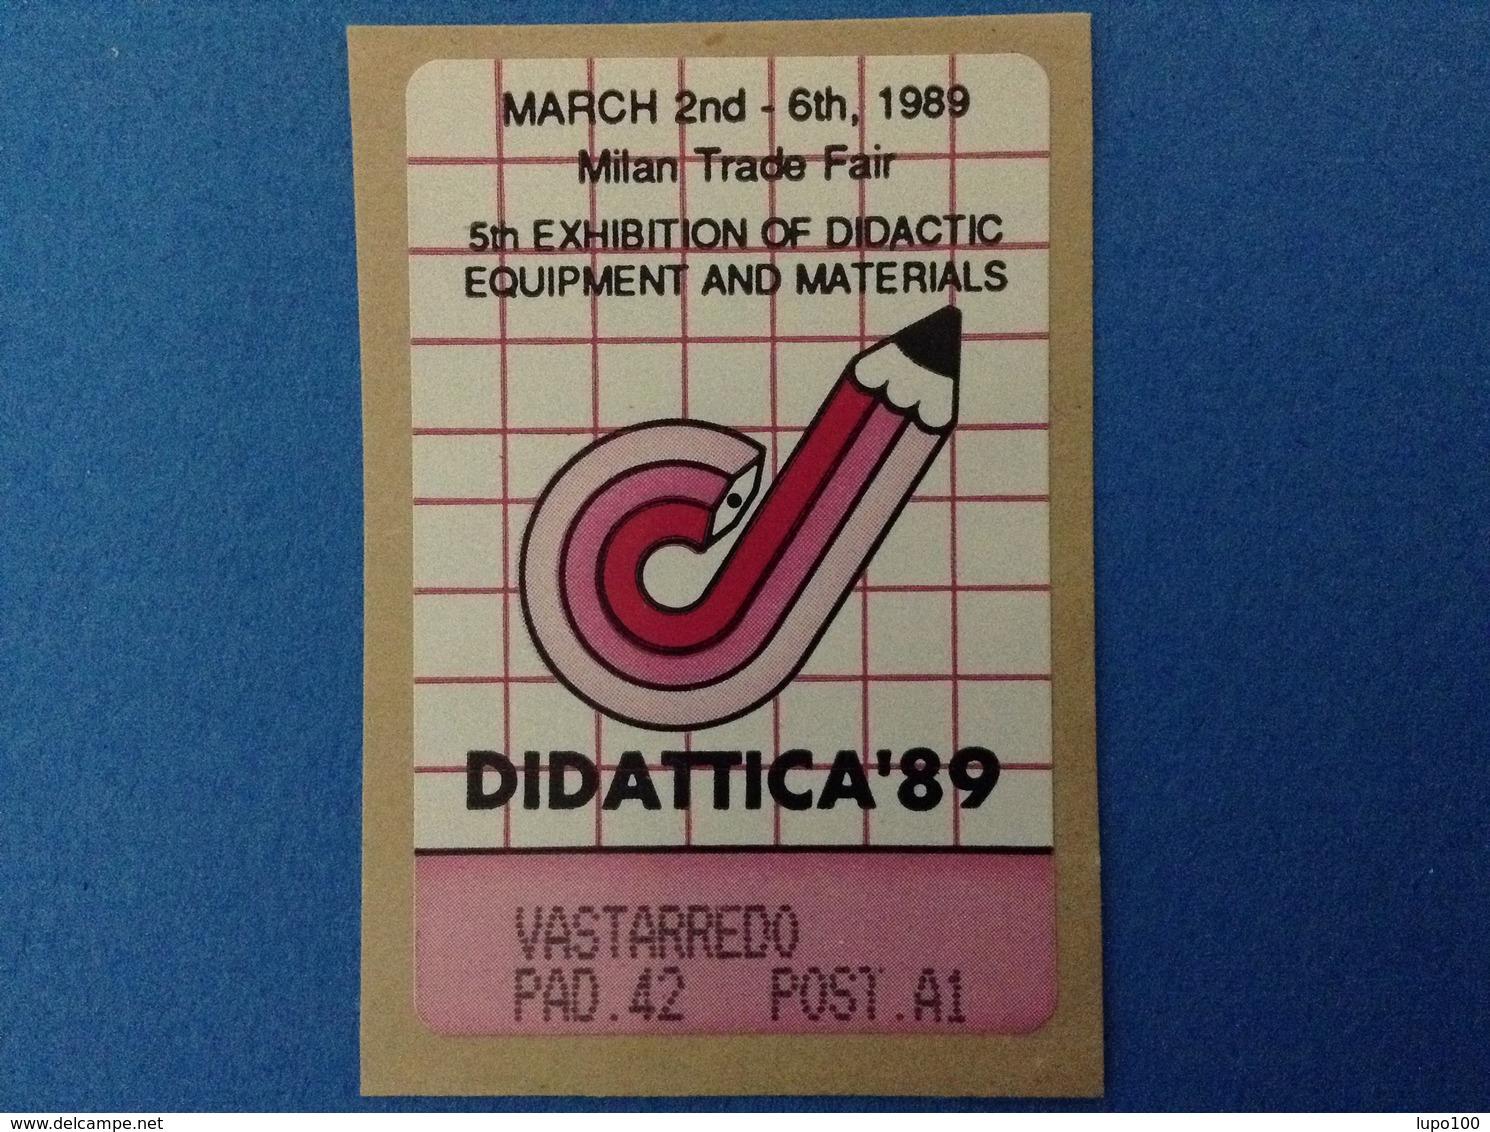 1989 ITALIA VIGNETTA ETICHETTA ERINNOFILO CINDERELLA - 1989 MILANO DIDATTICA CANCELLERIA VASTARREDO - Cinderellas